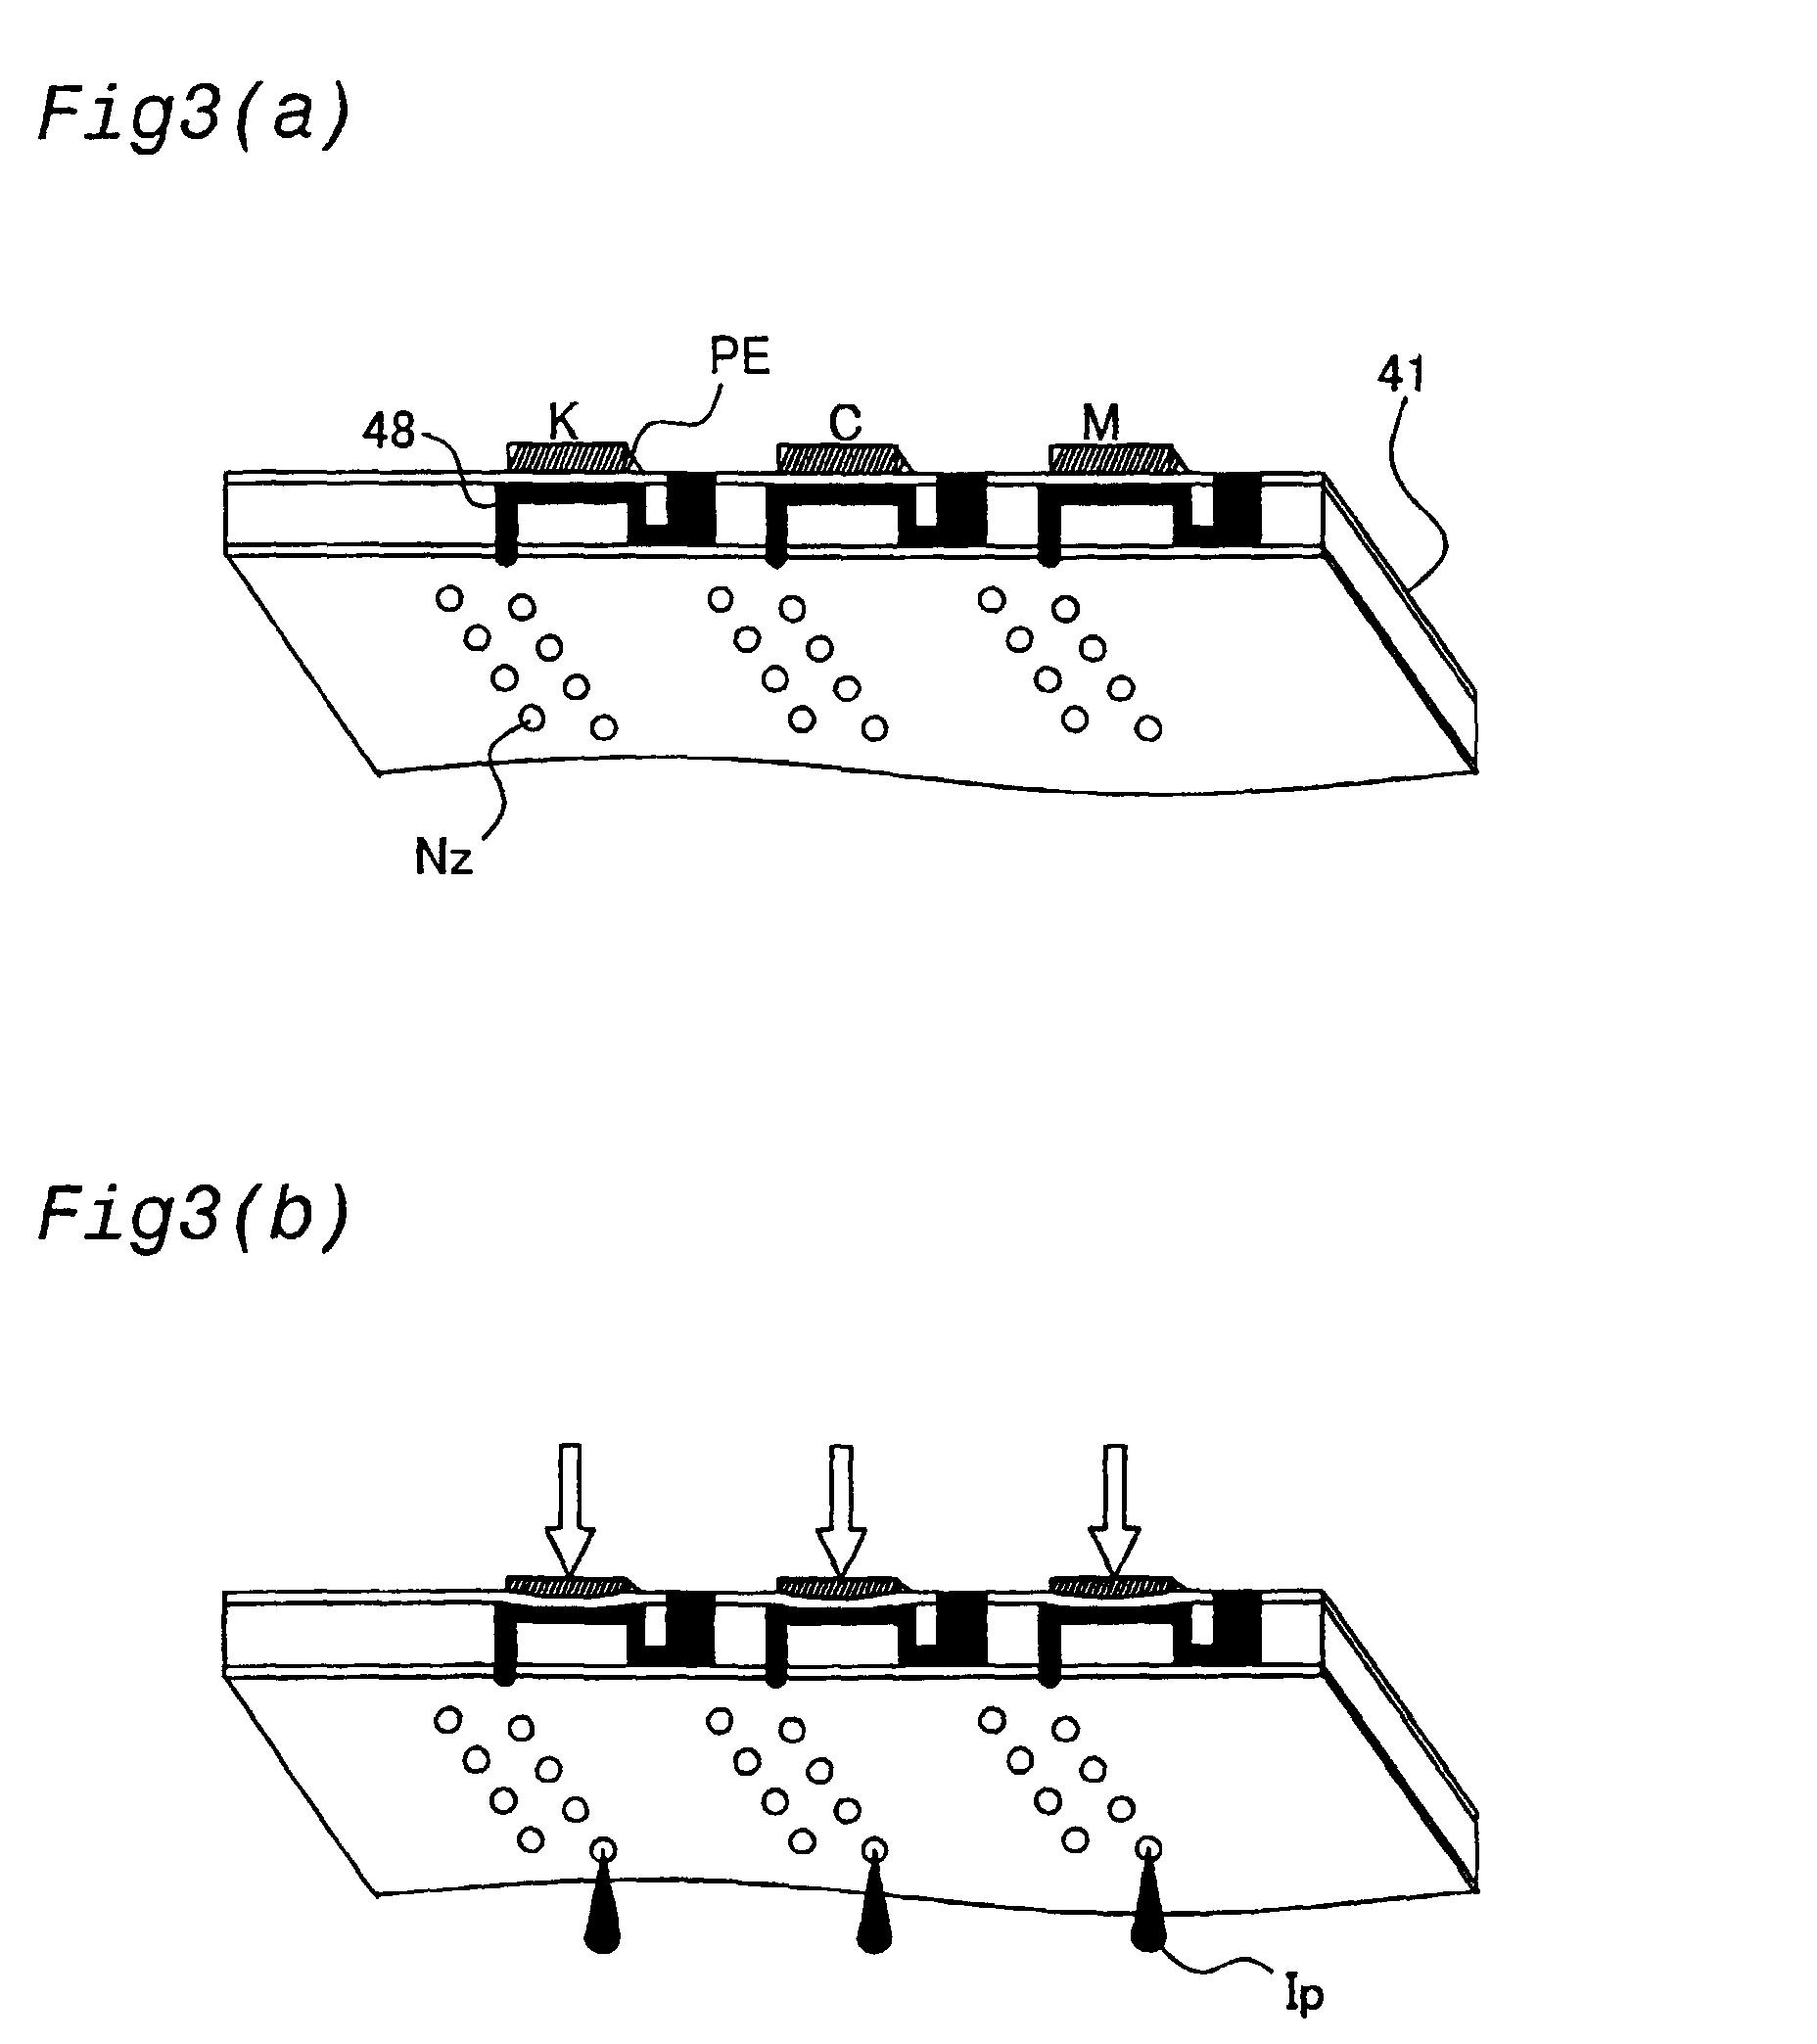 专利ep1039743a1 - convertisseur